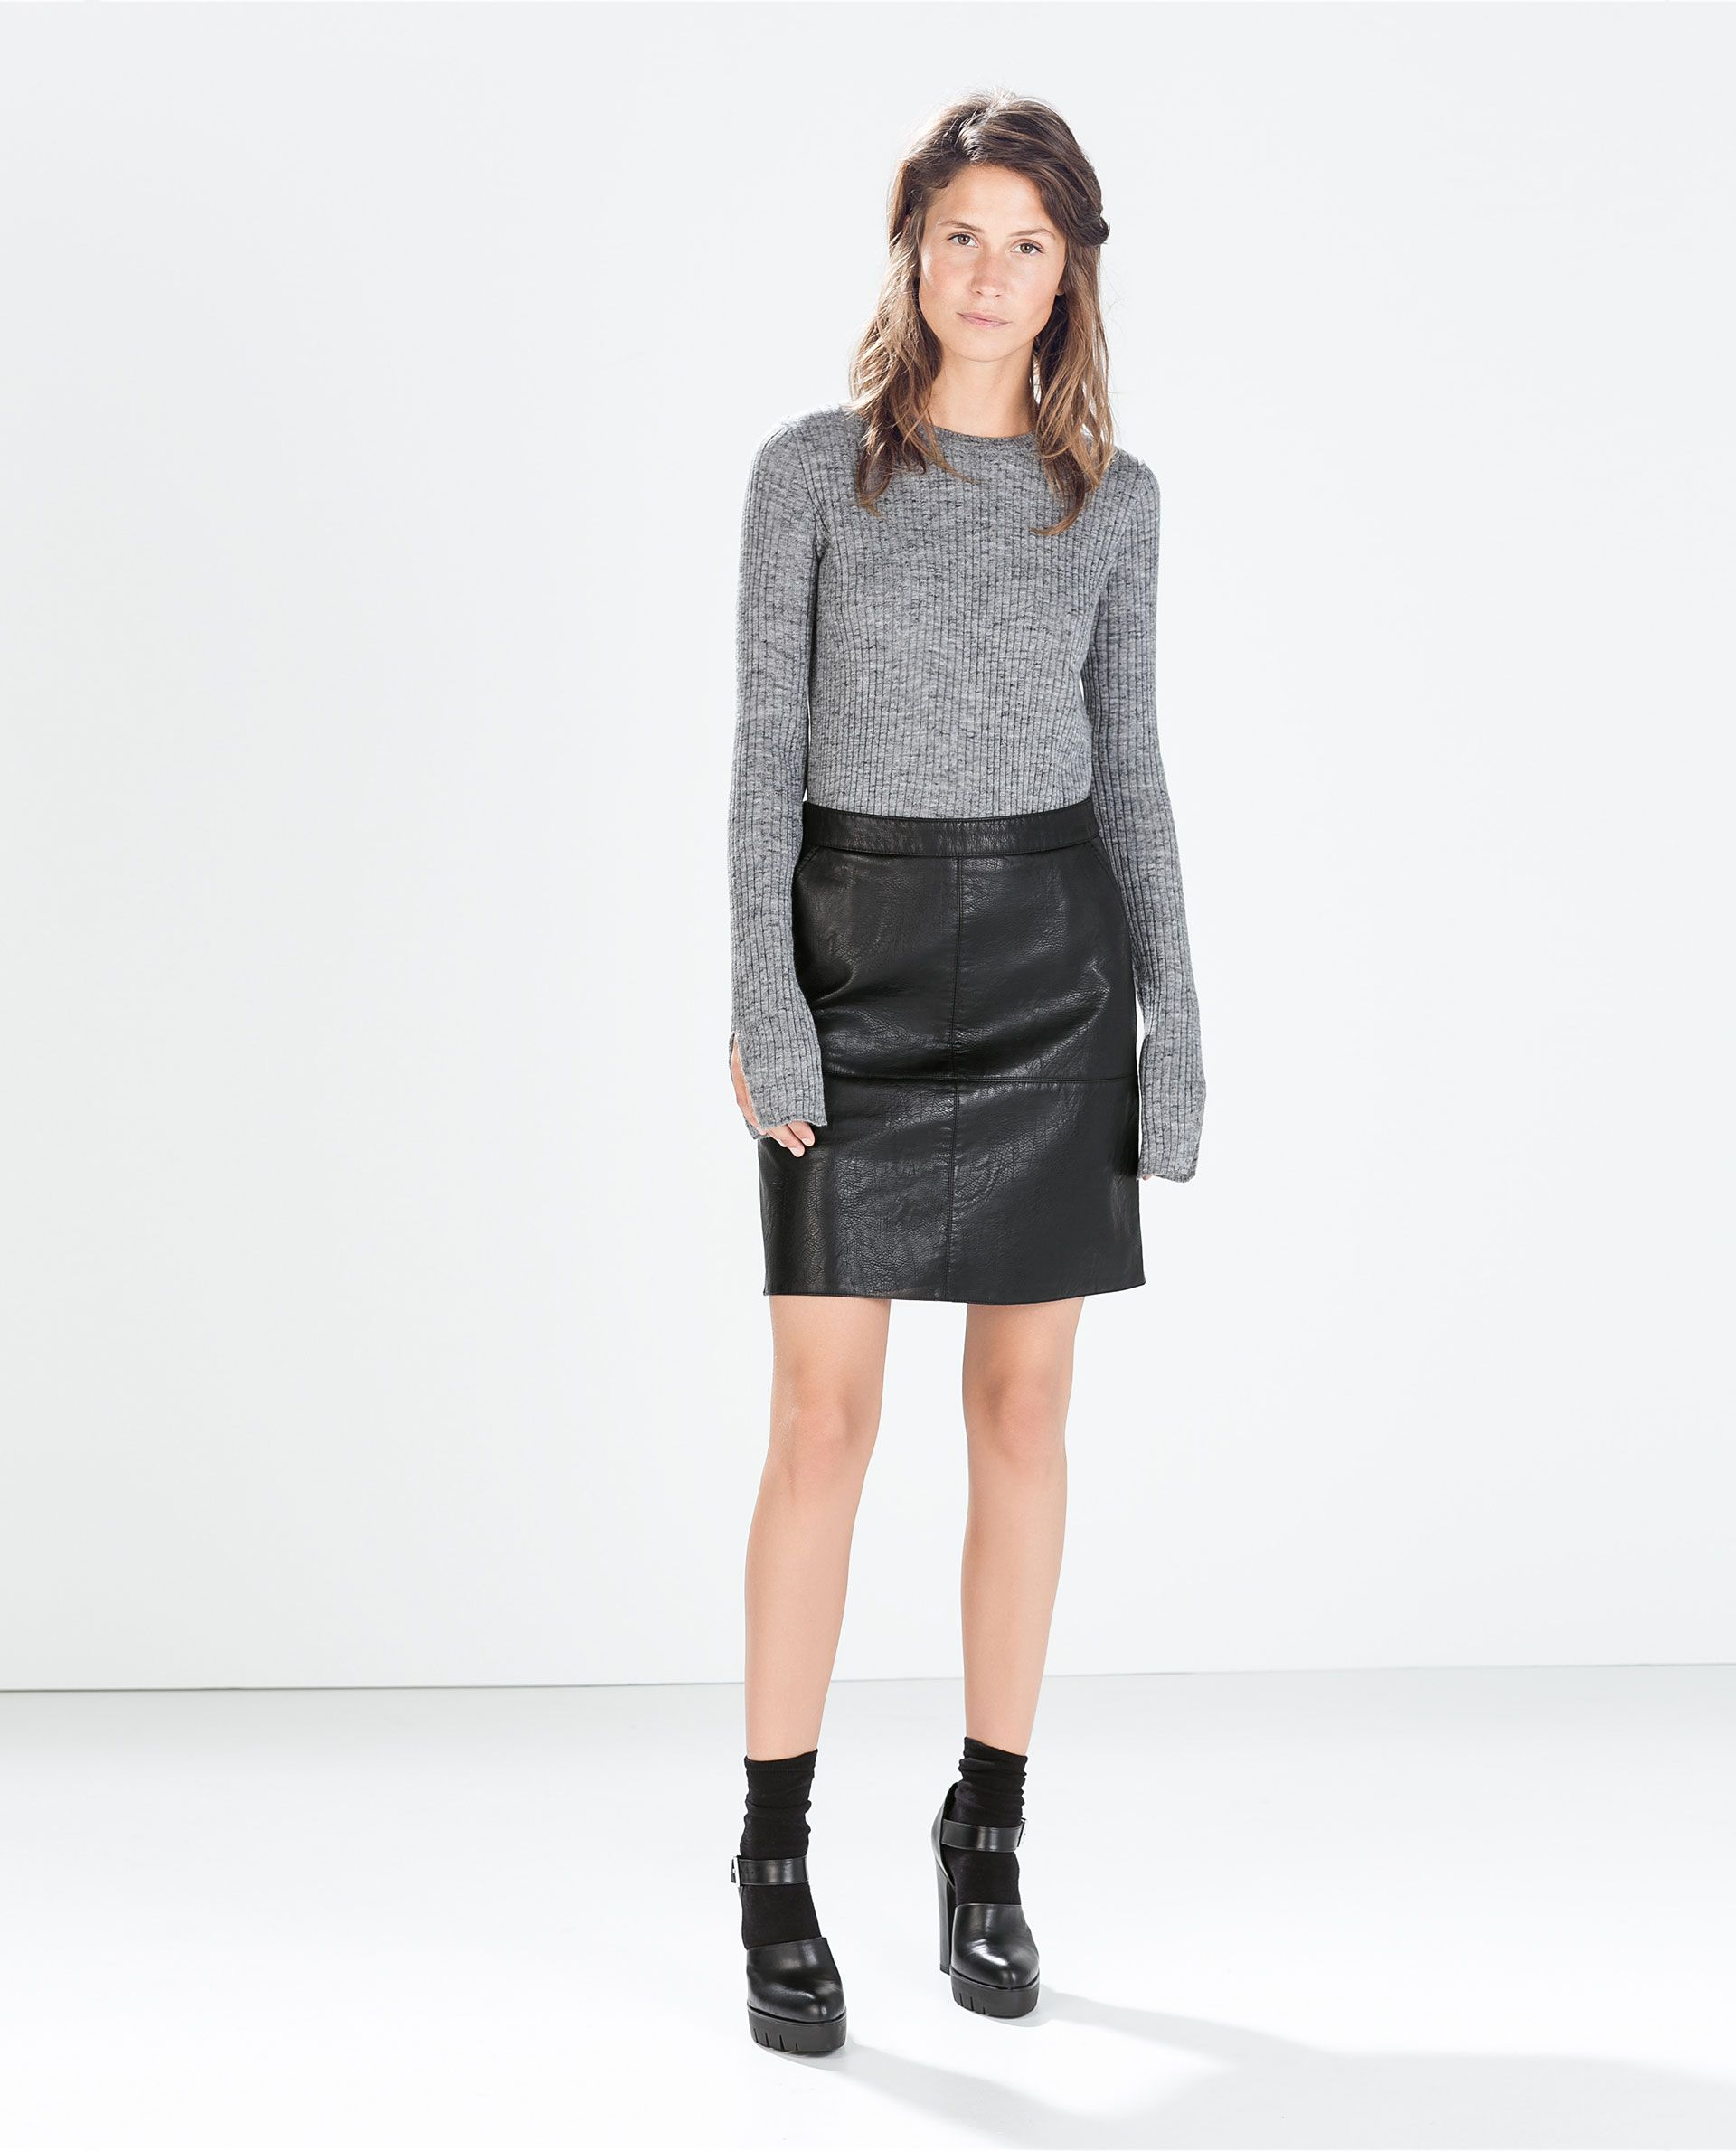 e7061deee6 Black Leather A Line Skirts